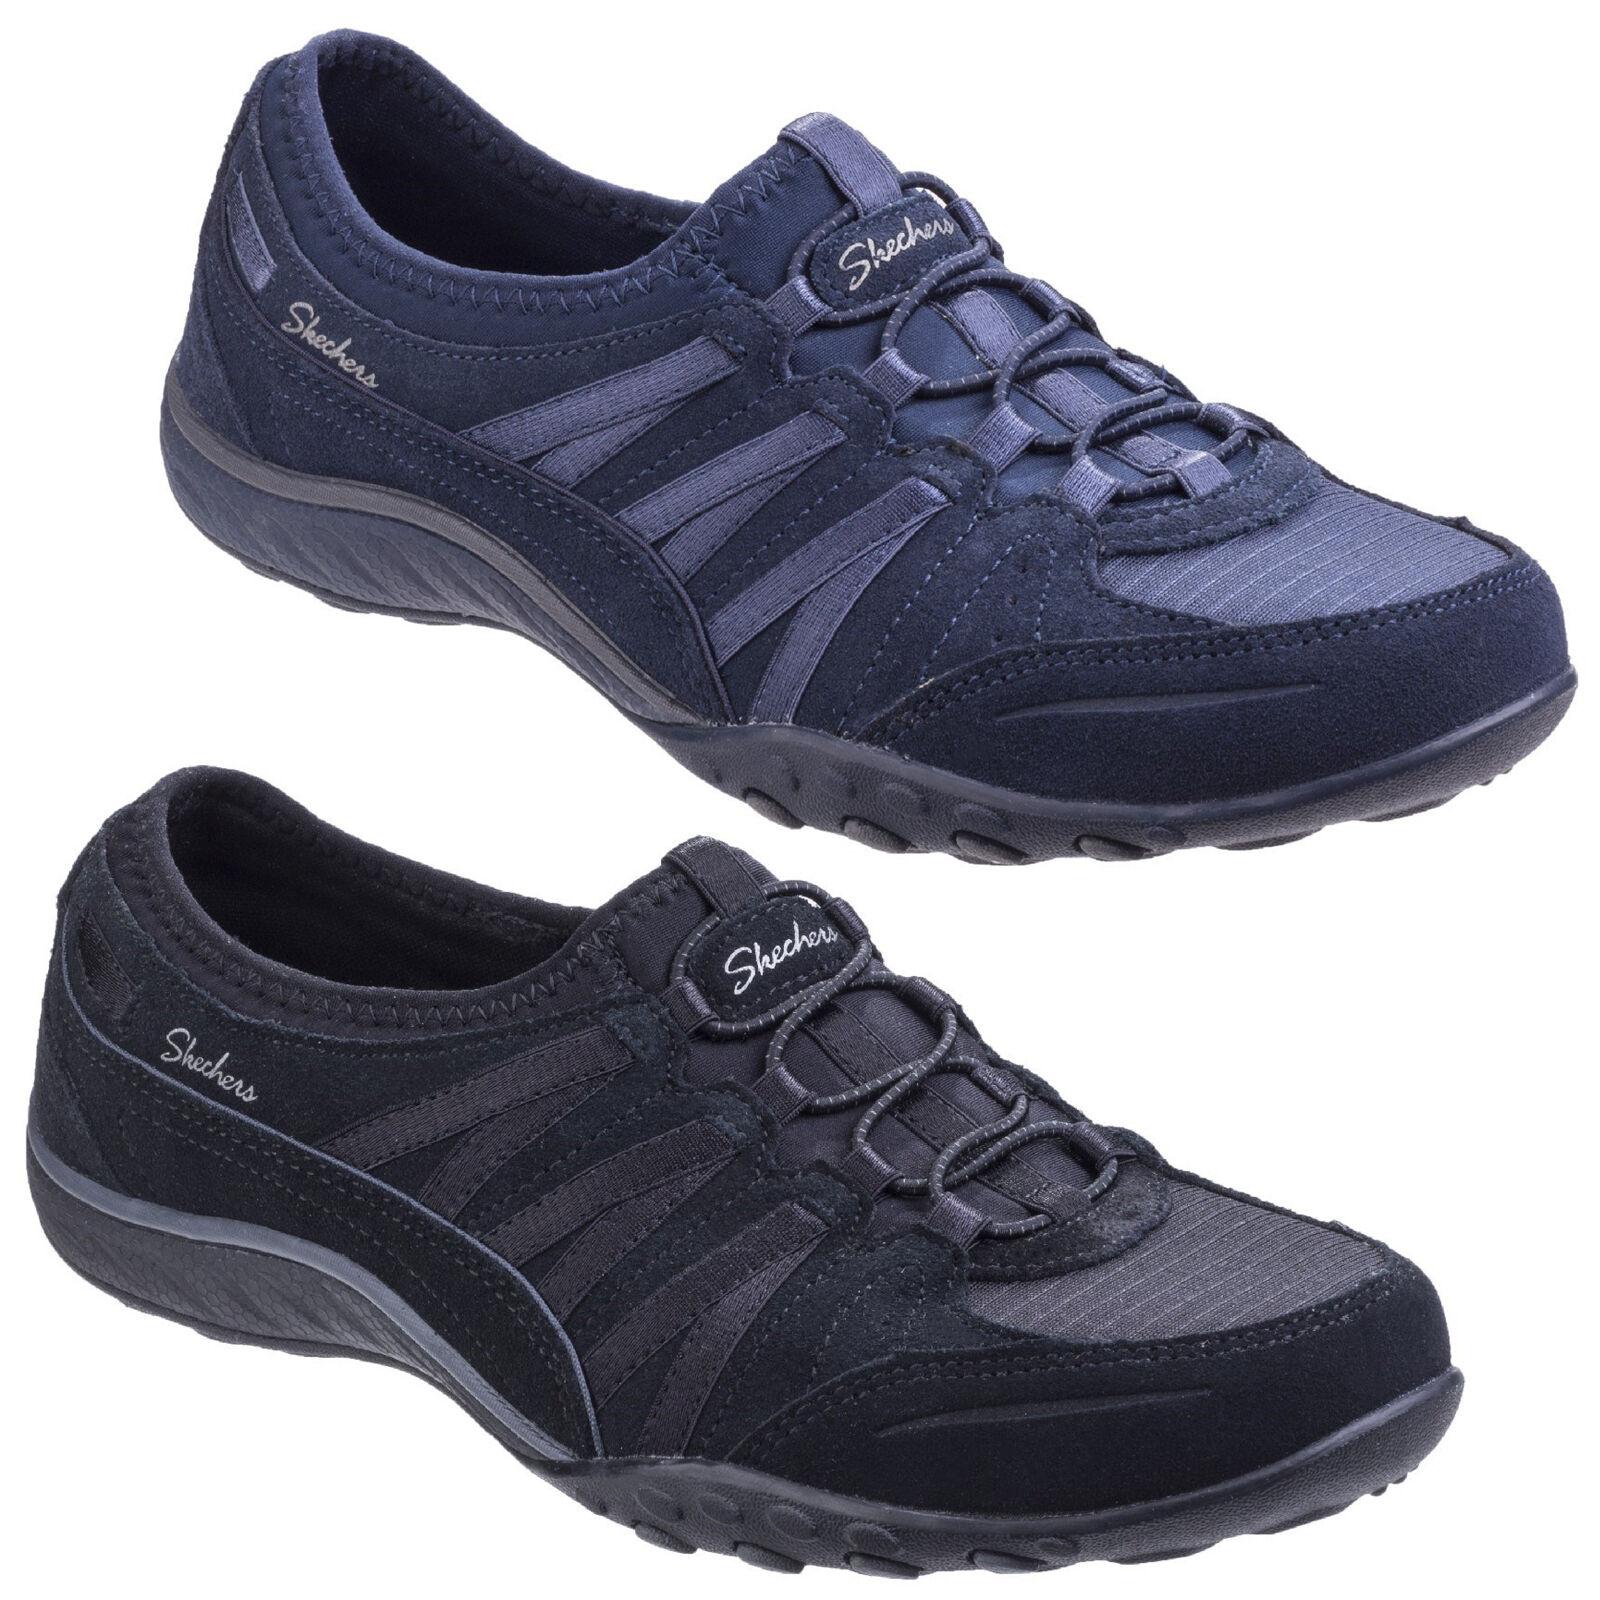 Skechers Breathe Easy Money Bags Trainers Womens Memory Foam Slip On shoes UK3-8